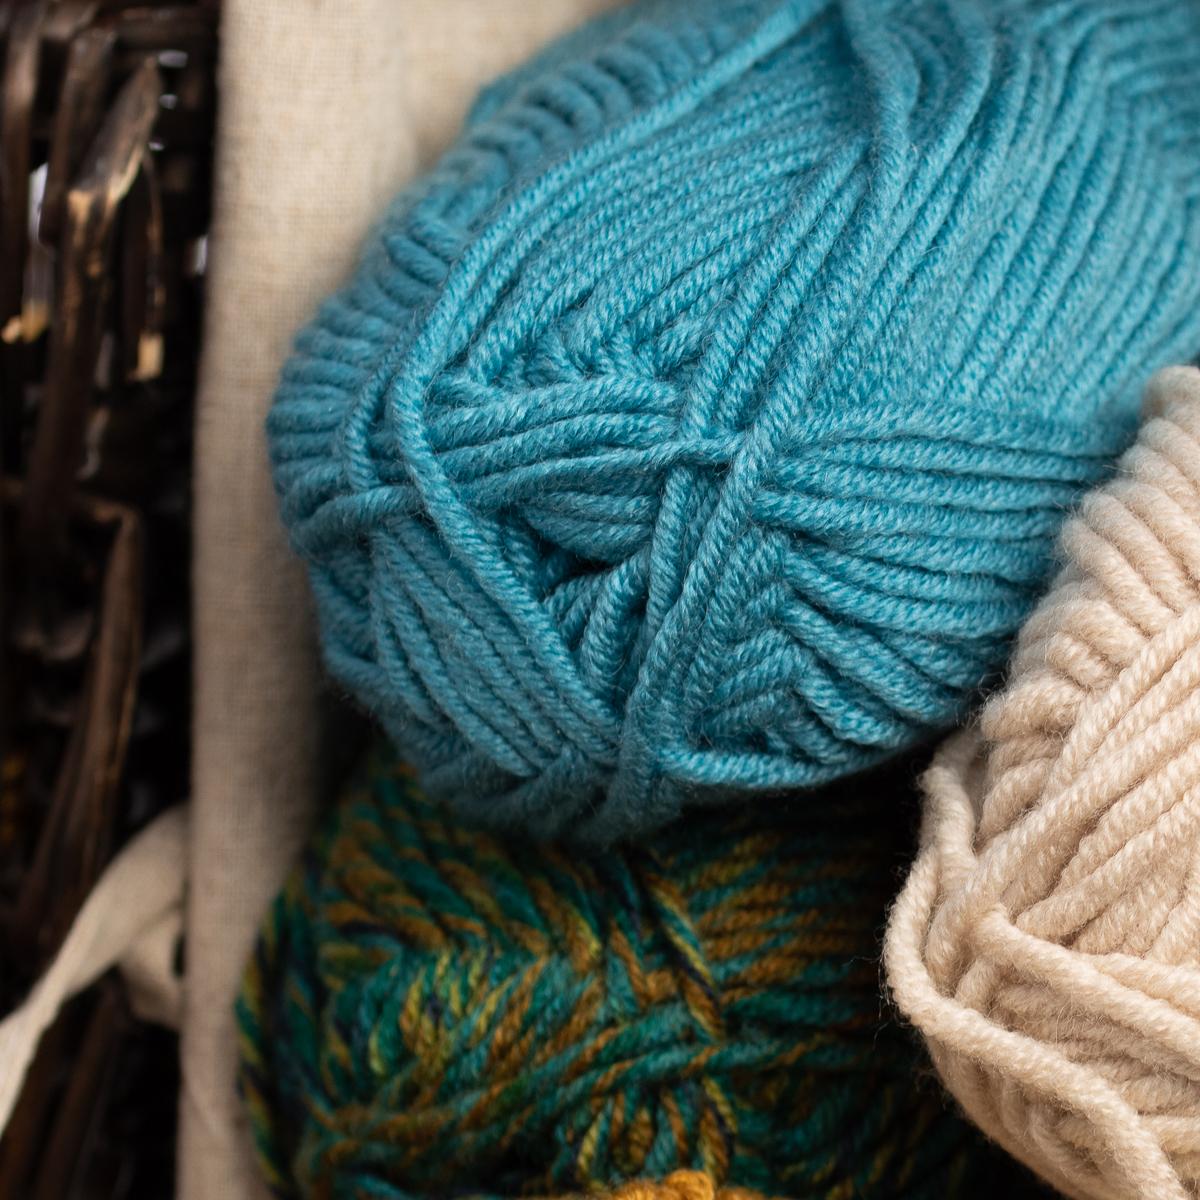 3pk-Lion-Brand-Woolspun-Acrylic-amp-Wool-Yarn-Bulky-5-Knit-Crocheting-Skeins-Soft thumbnail 14